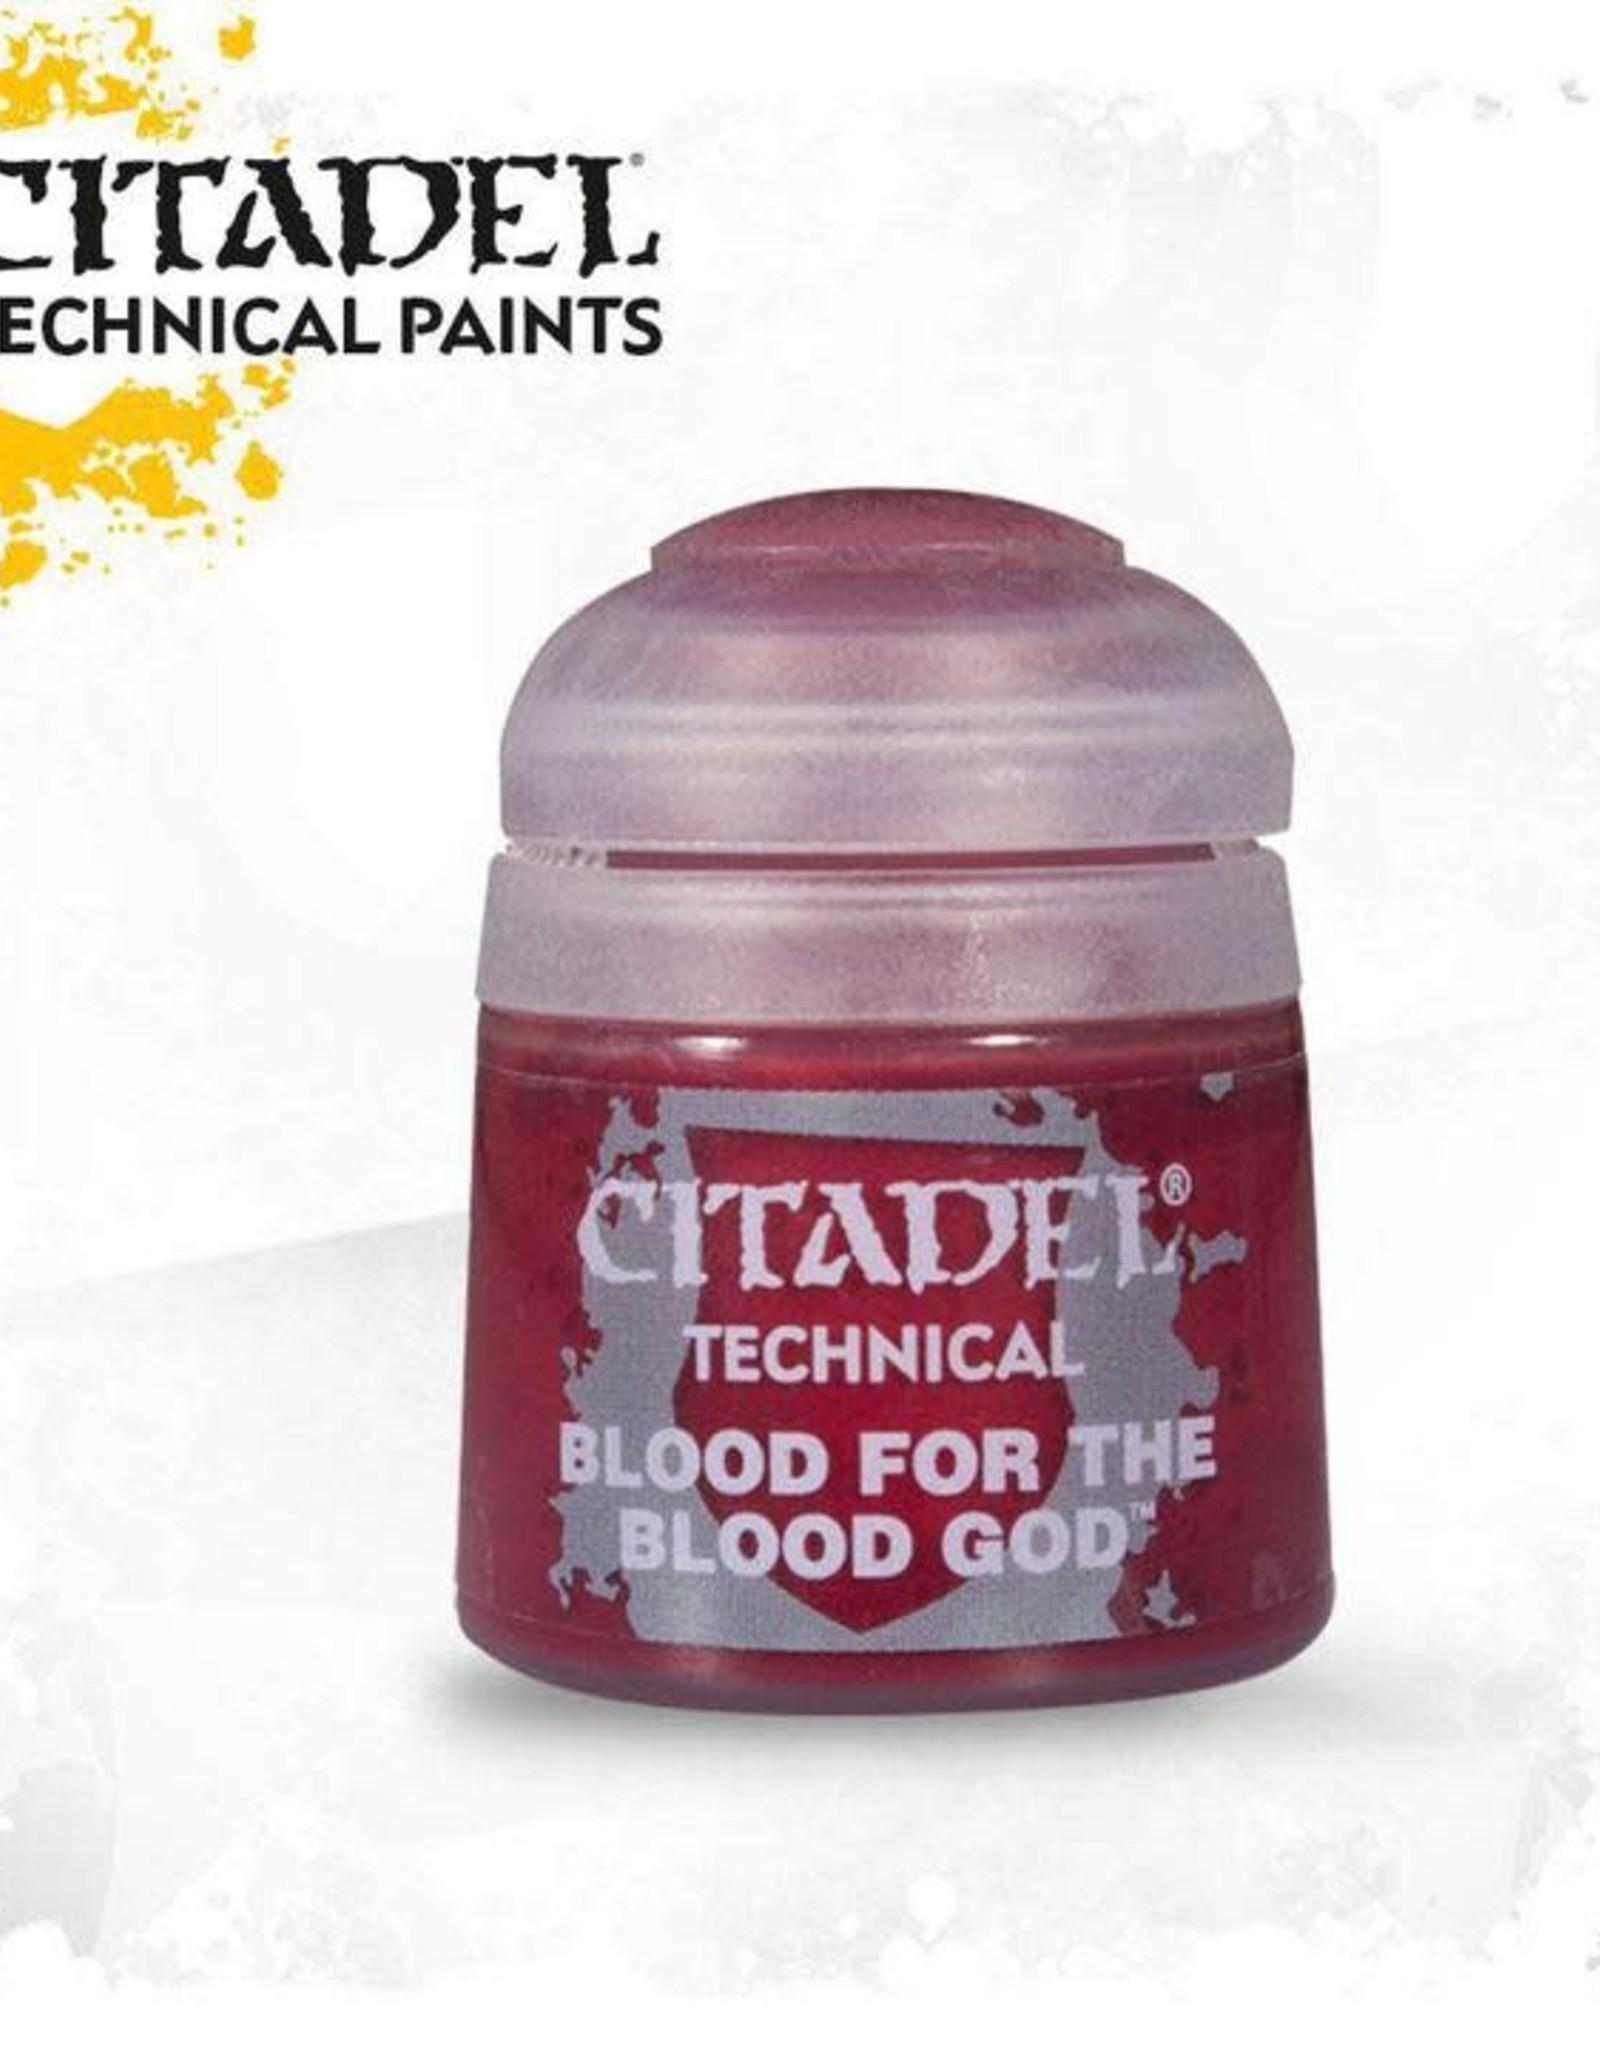 Games Workshop Citadel Paint: Technical - Blood For The Blood God